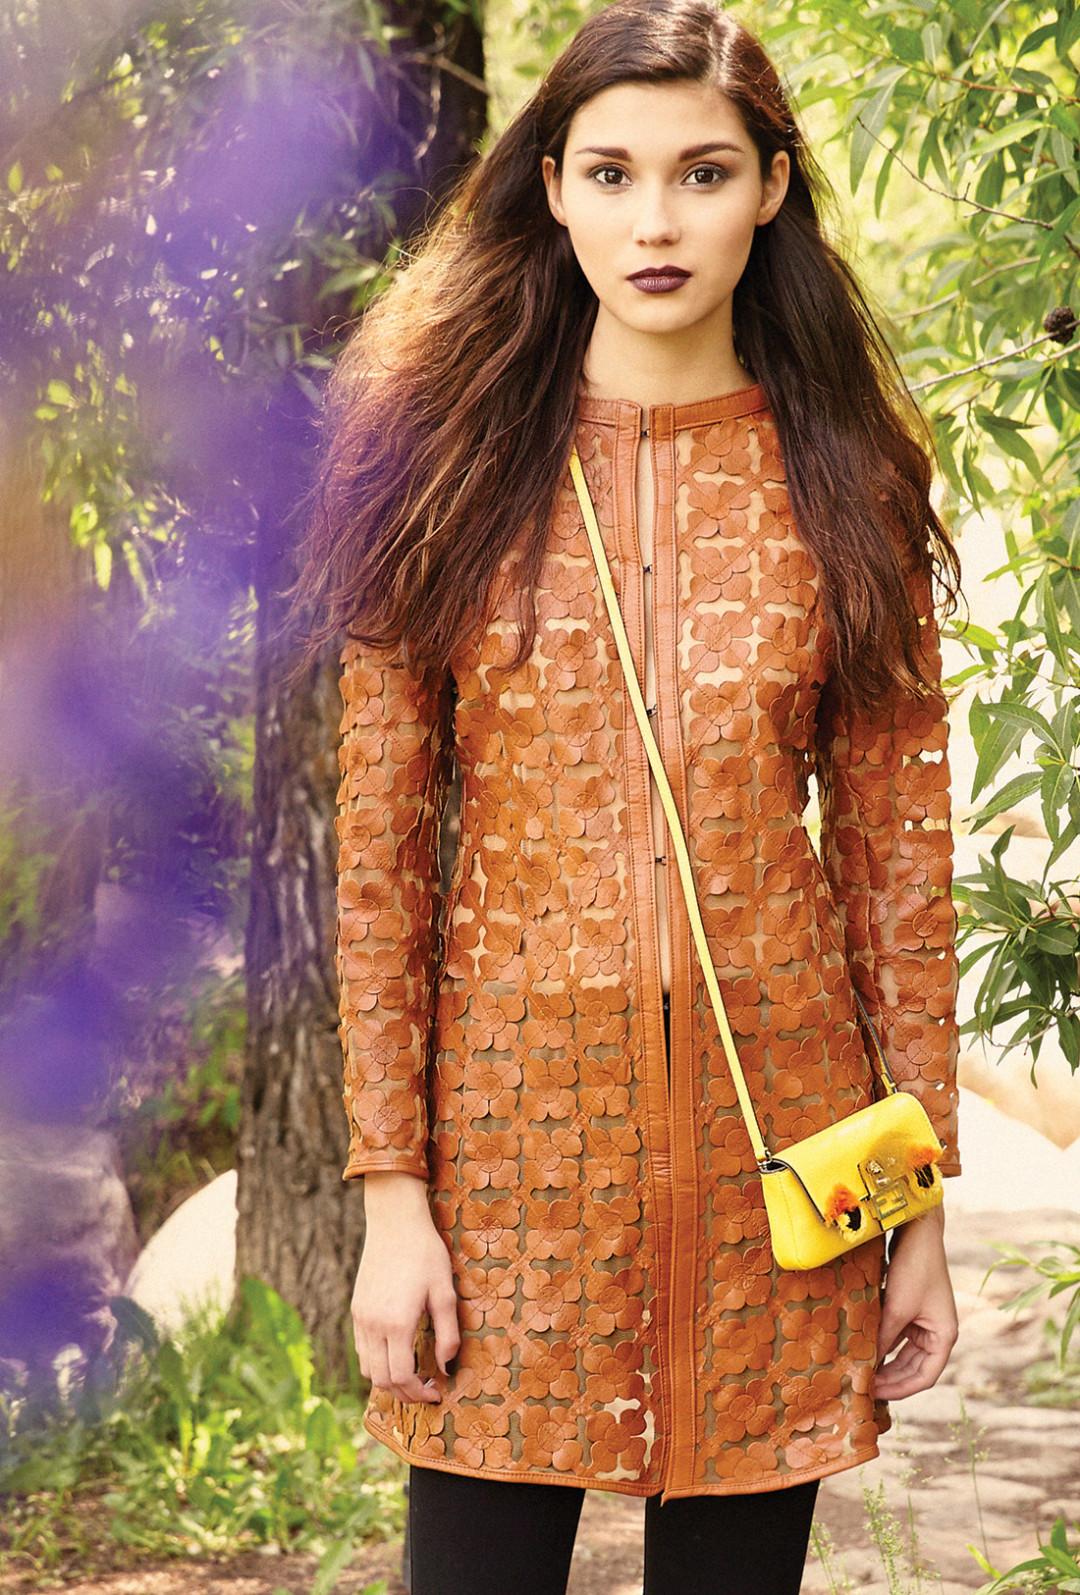 0715 garden glow brown dress tn0dmi